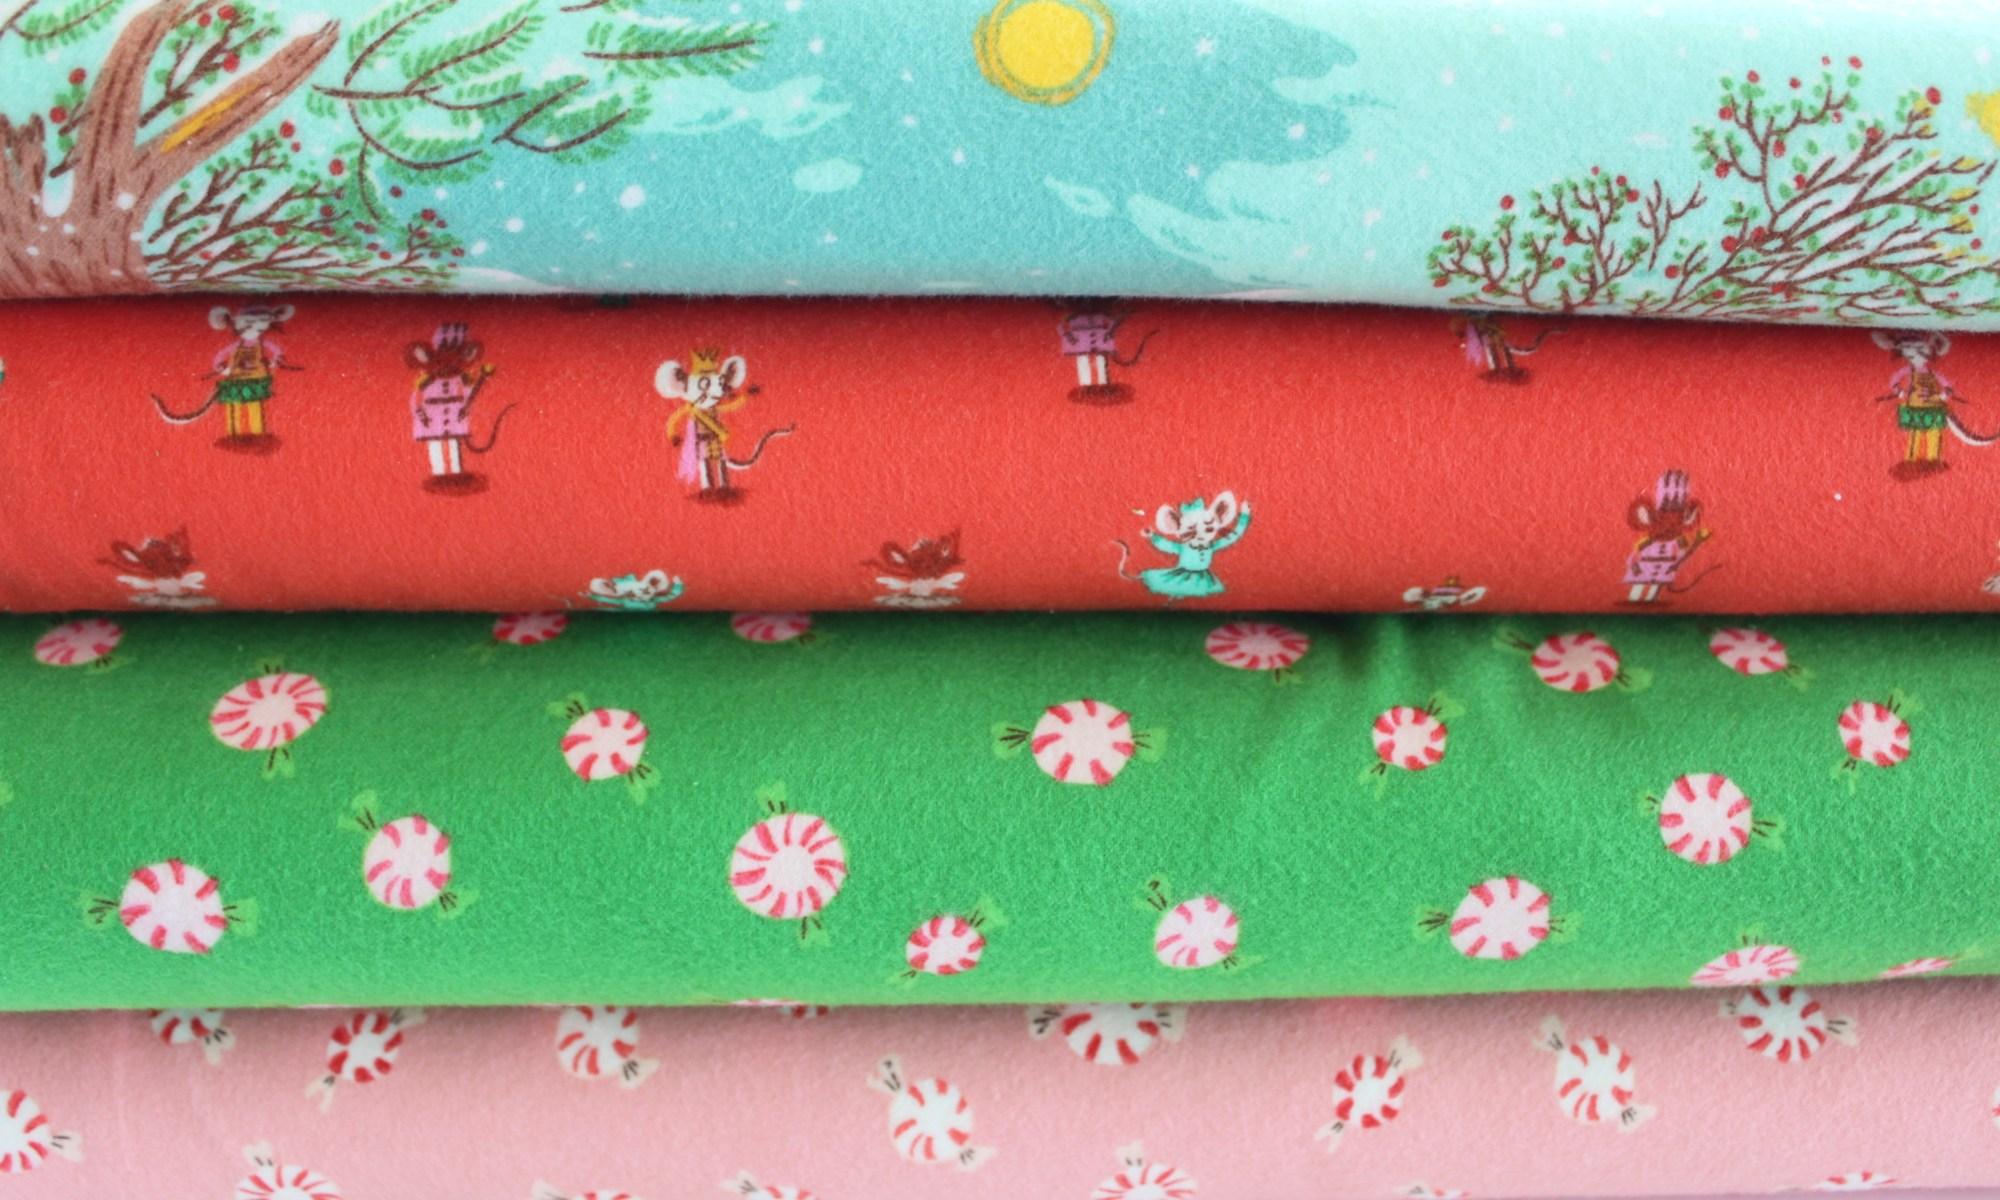 Flannel Christmas fabric